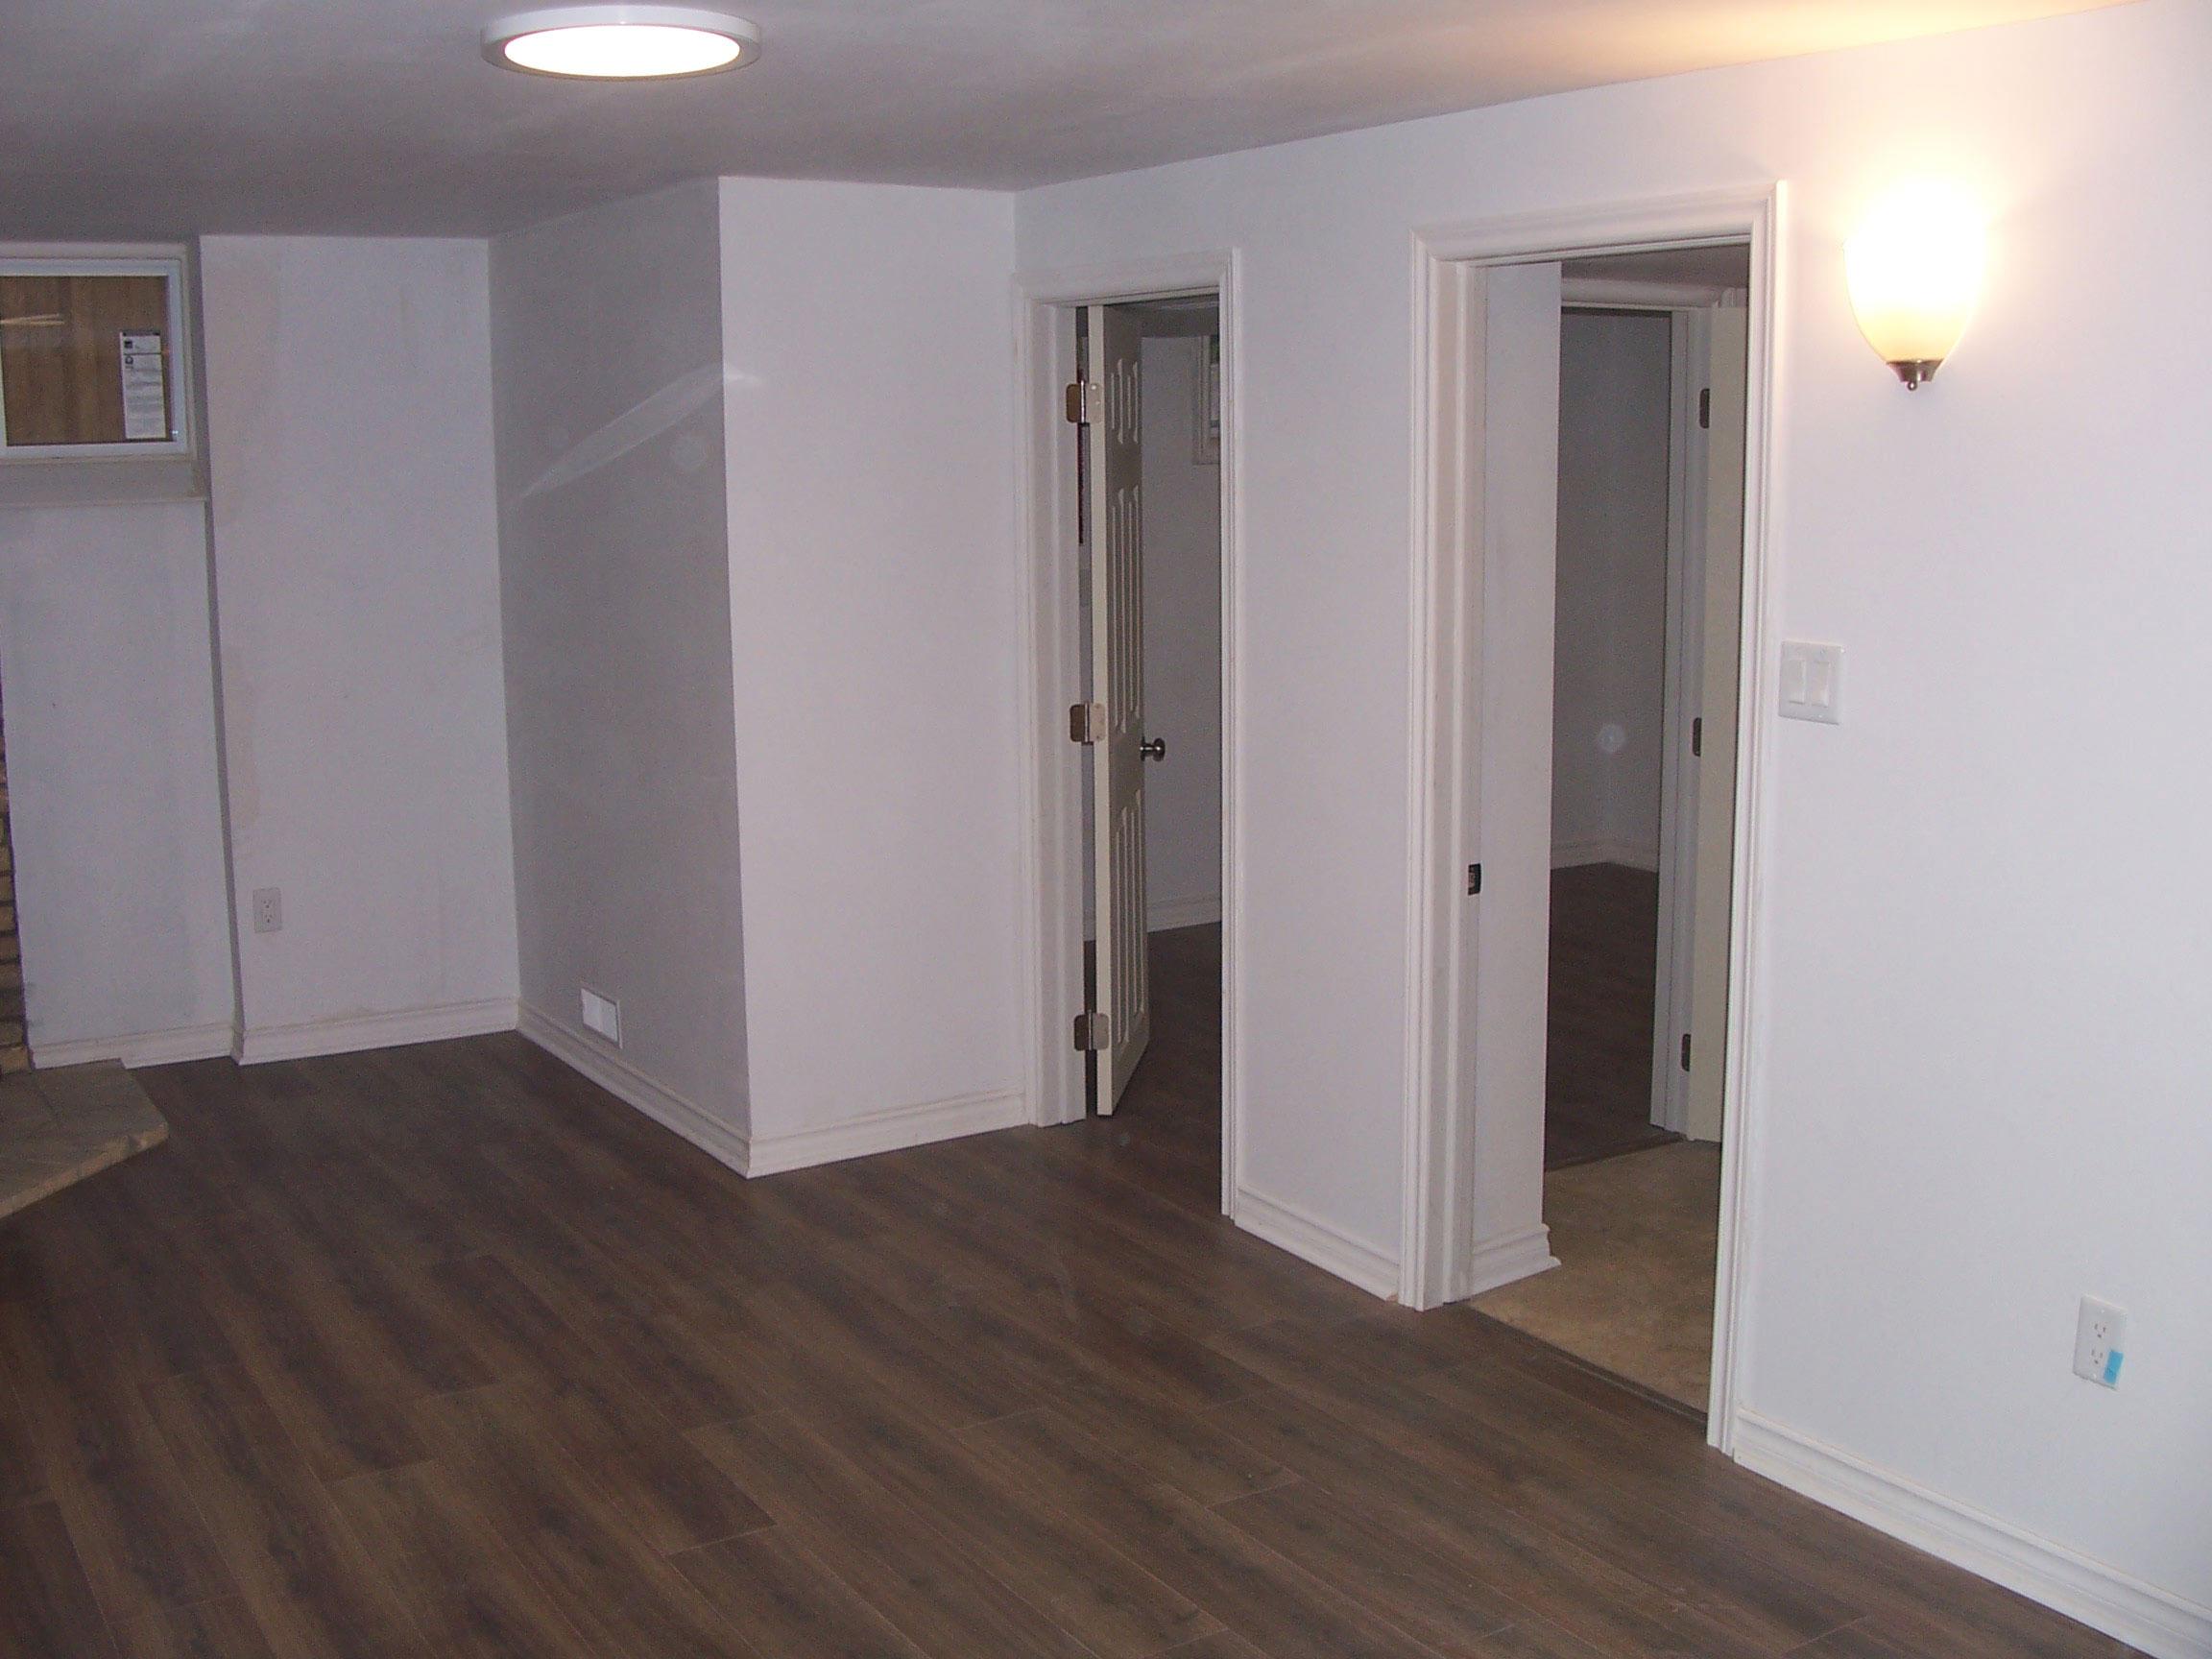 Basement Main Room After